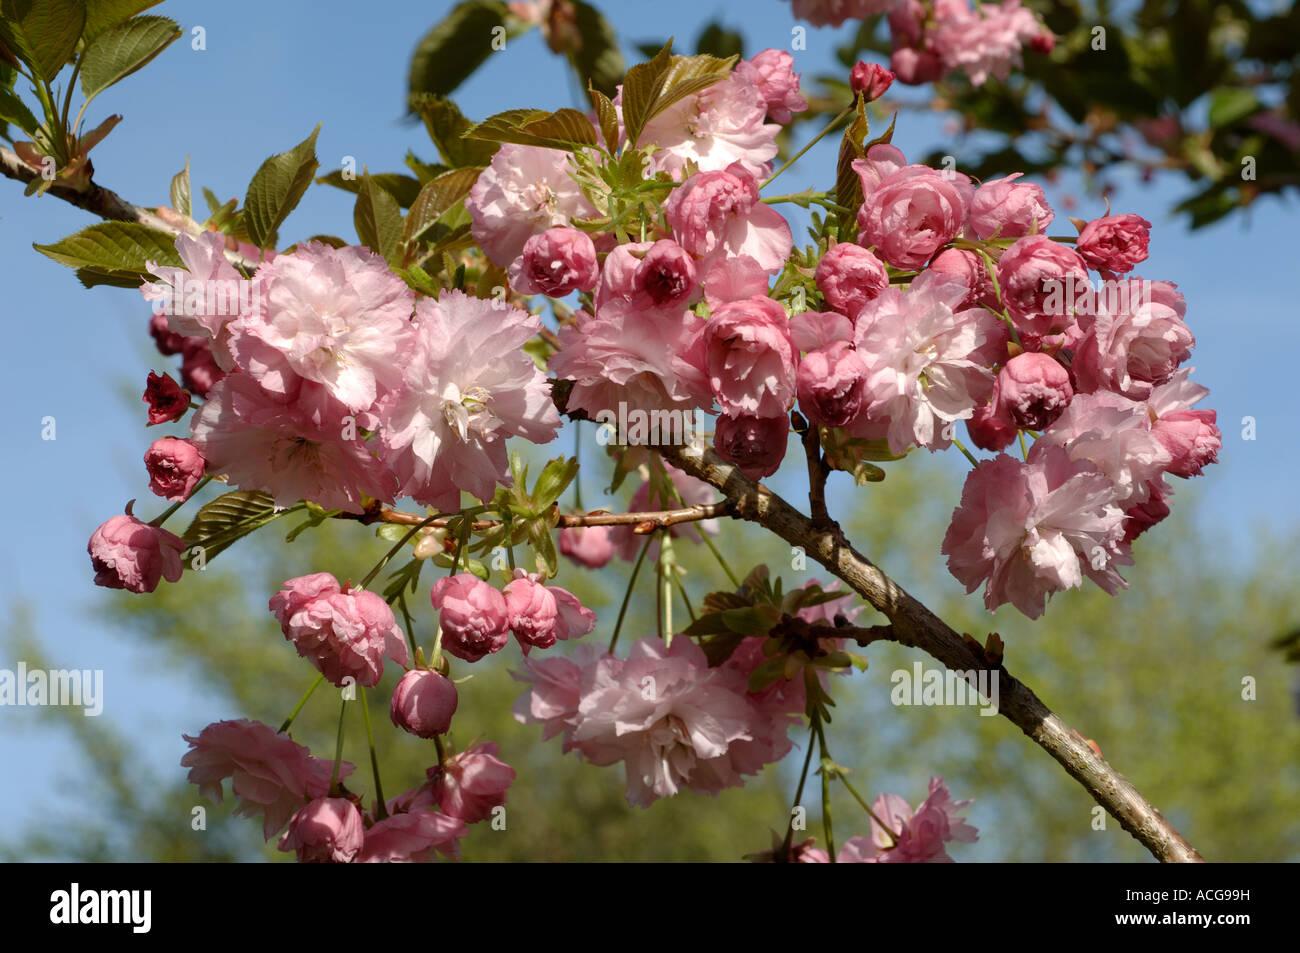 Prunus Pink Perfection flowers on an ornamental flowering cherry - Stock Image